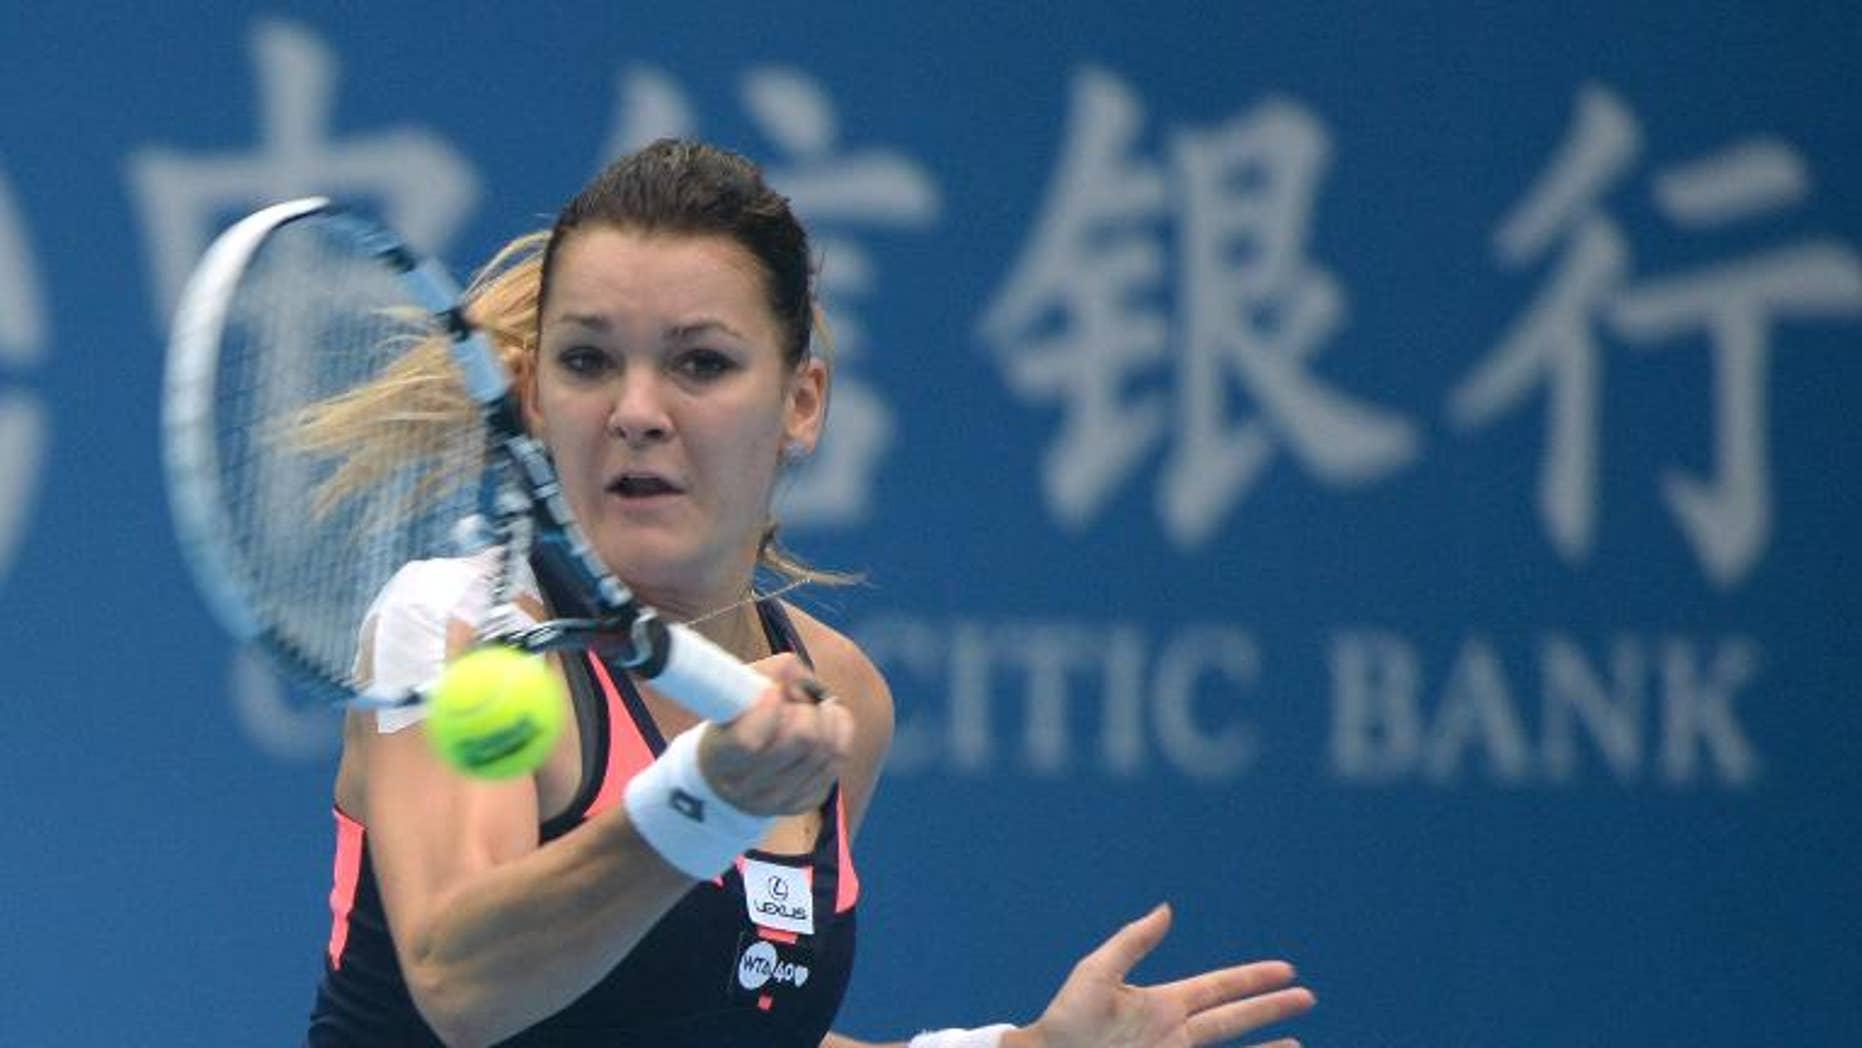 Agnieszka Radwanska of Poland returns to Stefanie Voegele of Switzerland during their women's single match at the China Open tennis tournament in Beijing on September 29, 2013